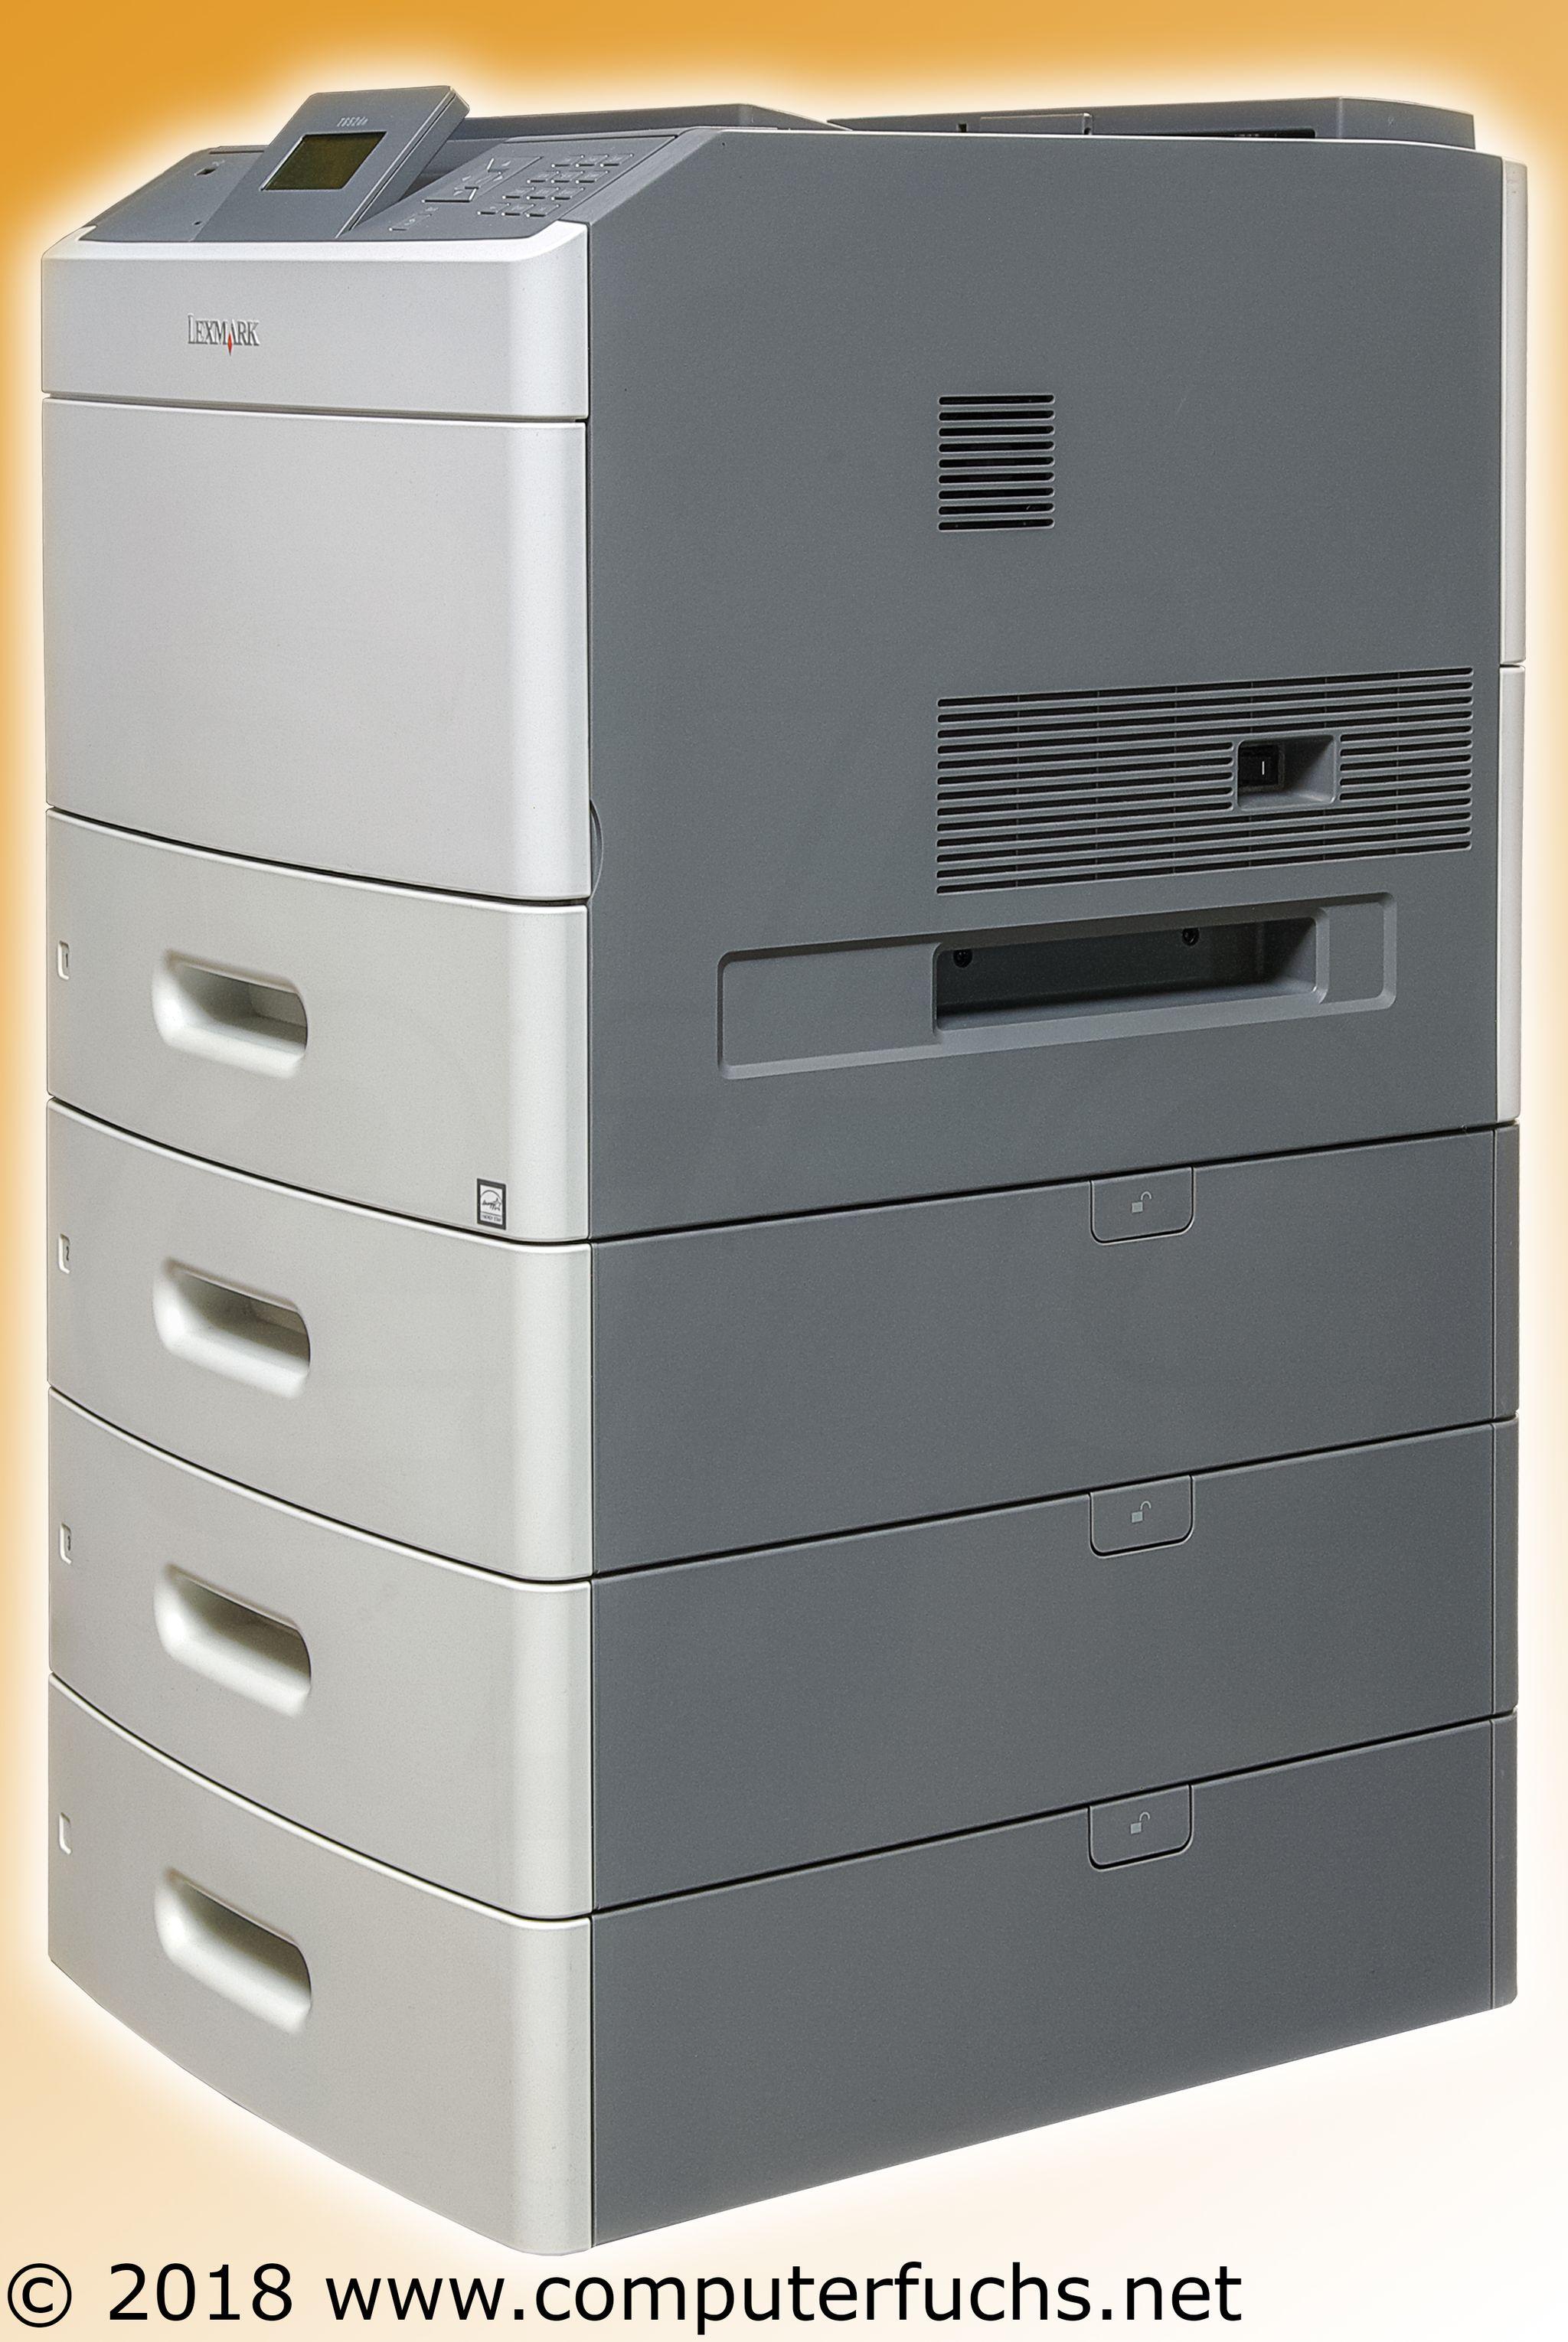 Lexmark-Optra-T652dn-T652dtn-Laserdrucker-30G0202-verschiedene-Varianten